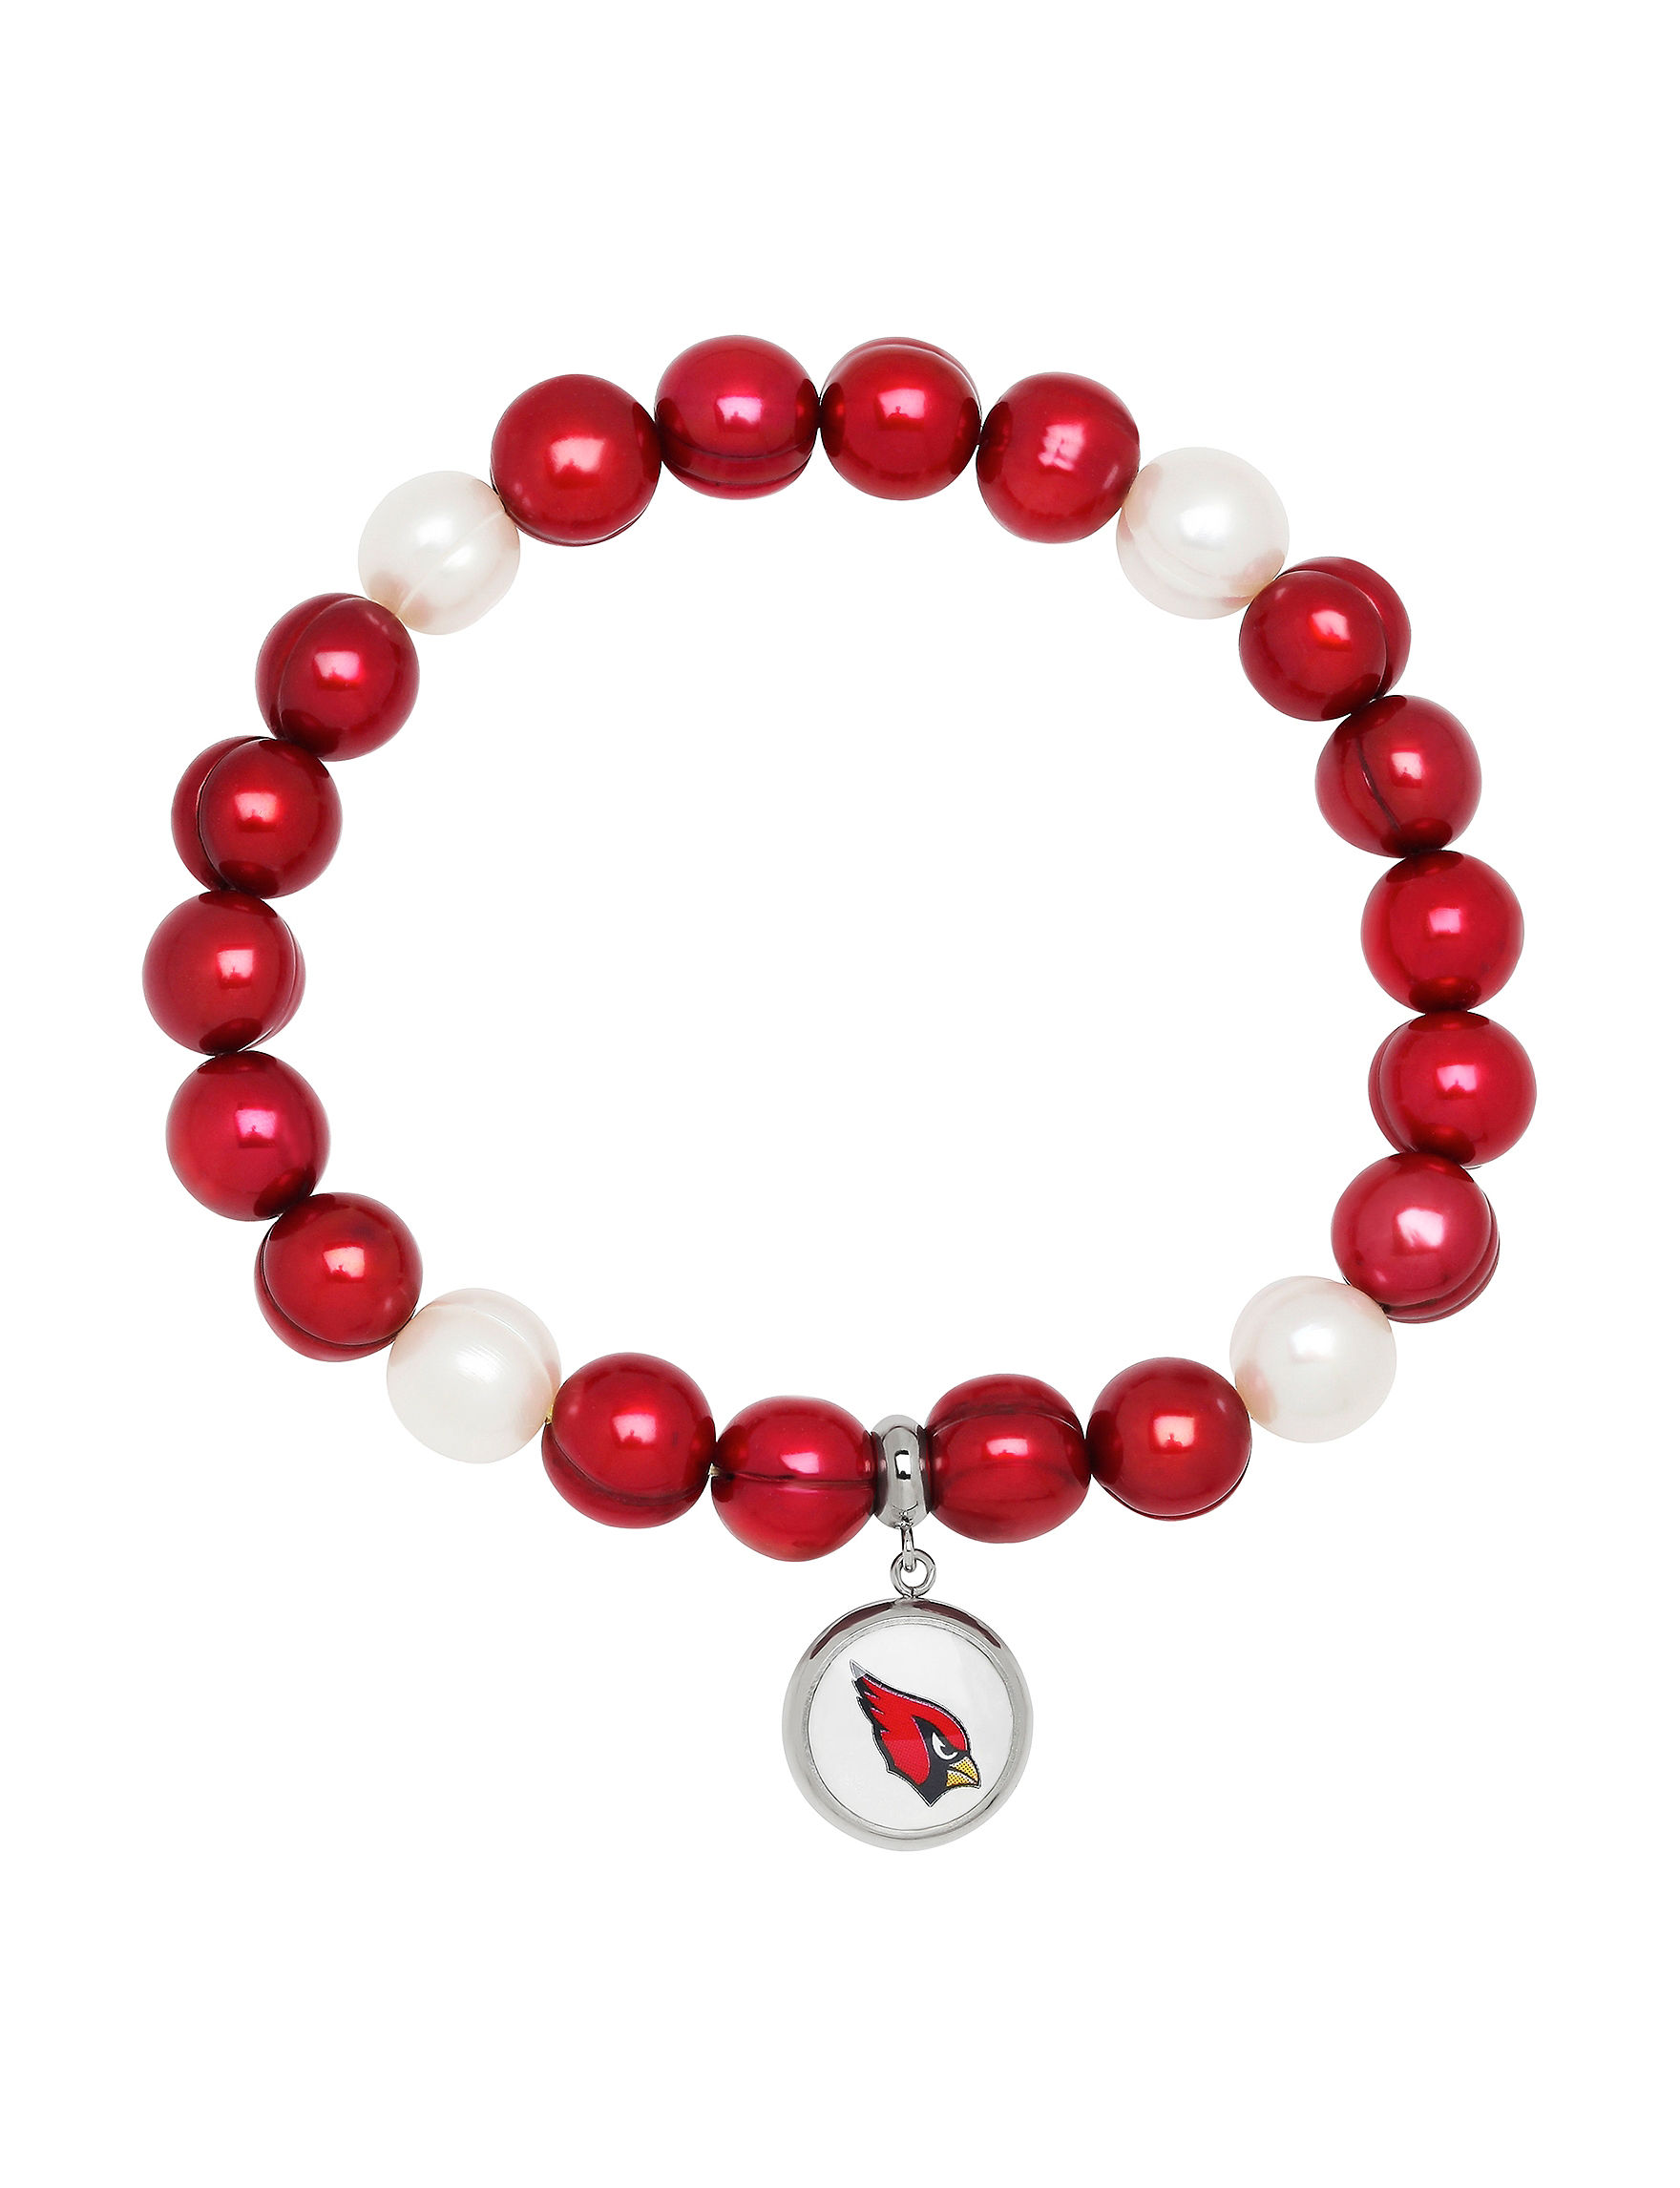 Aurafin Oro America Red / White Bracelets Charms Fashion Jewelry NFL